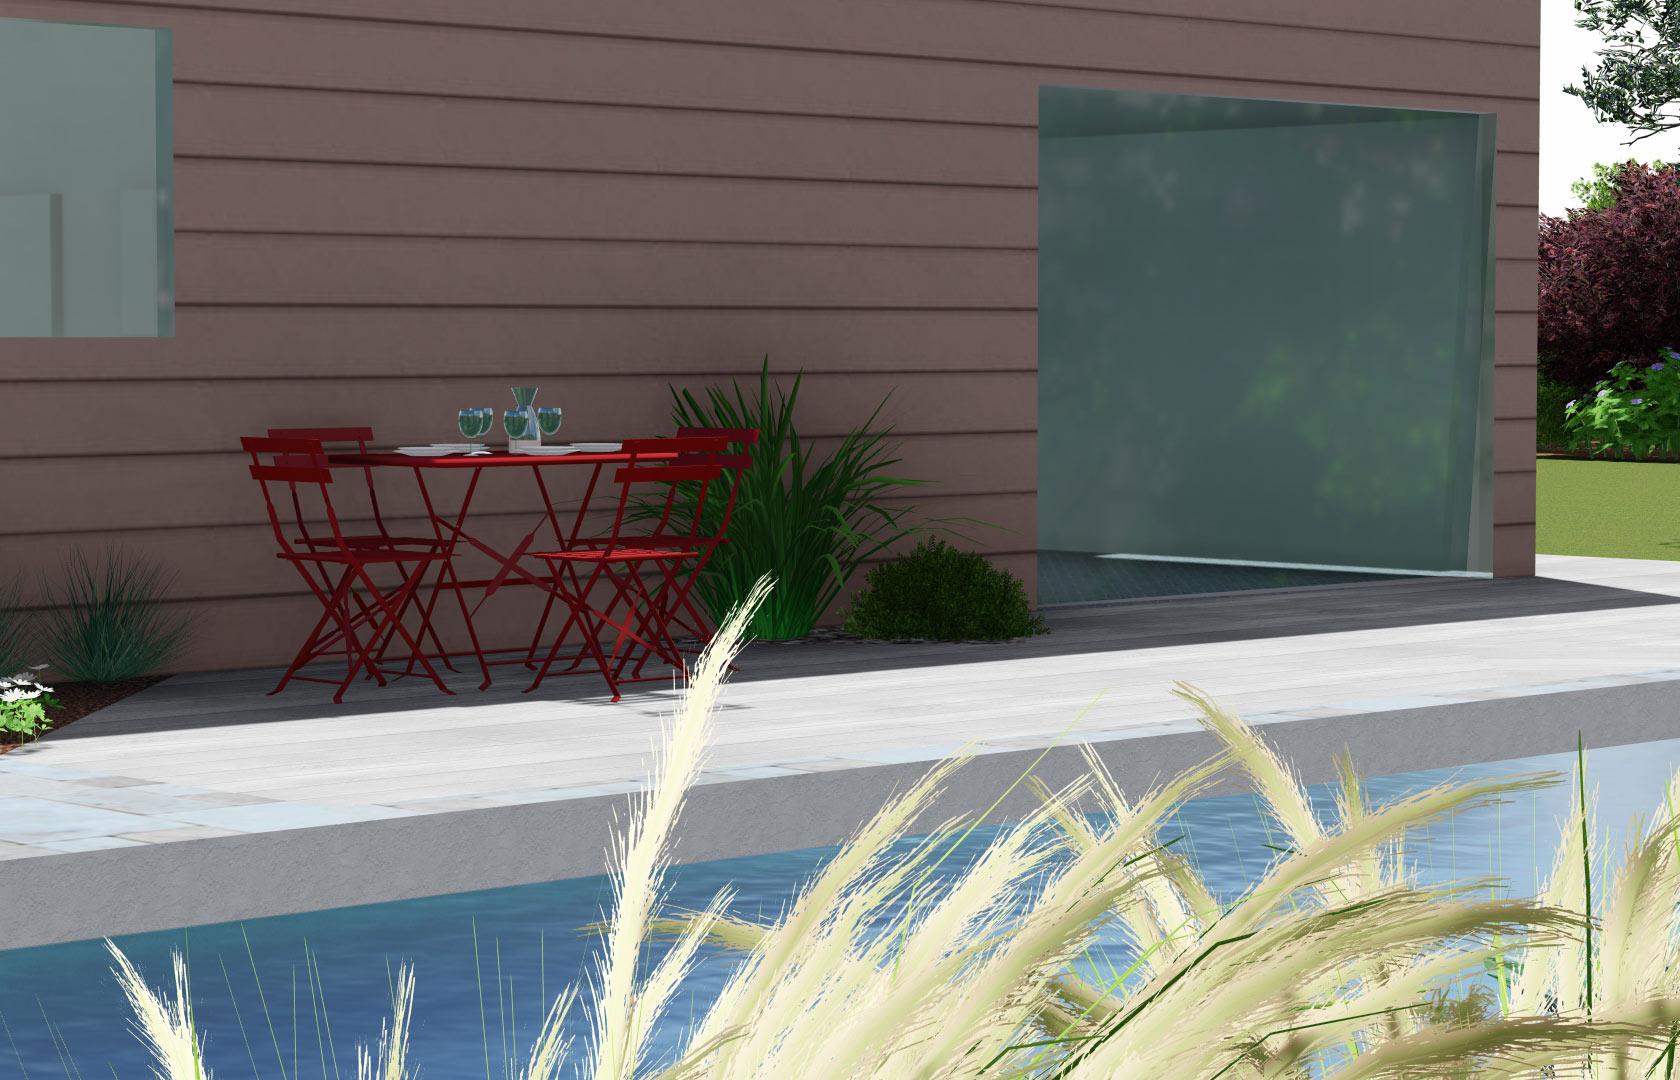 Serrault Jardins, imagine votre terrasse et abords de piscine.